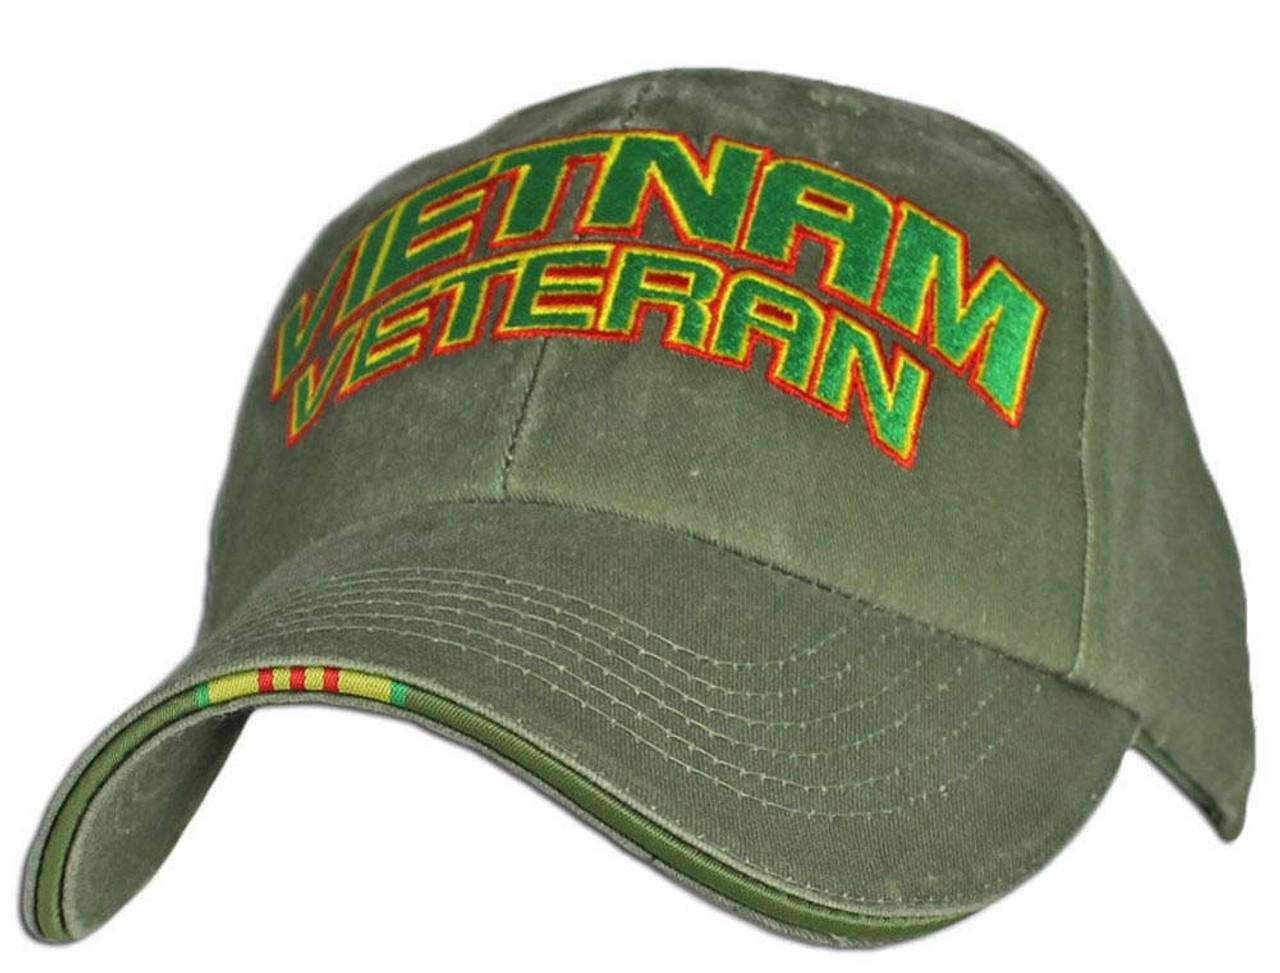 Vietnam Veteran ODG Miltary Hat Baseball Cap (You are Appreciated) a017039dbe47